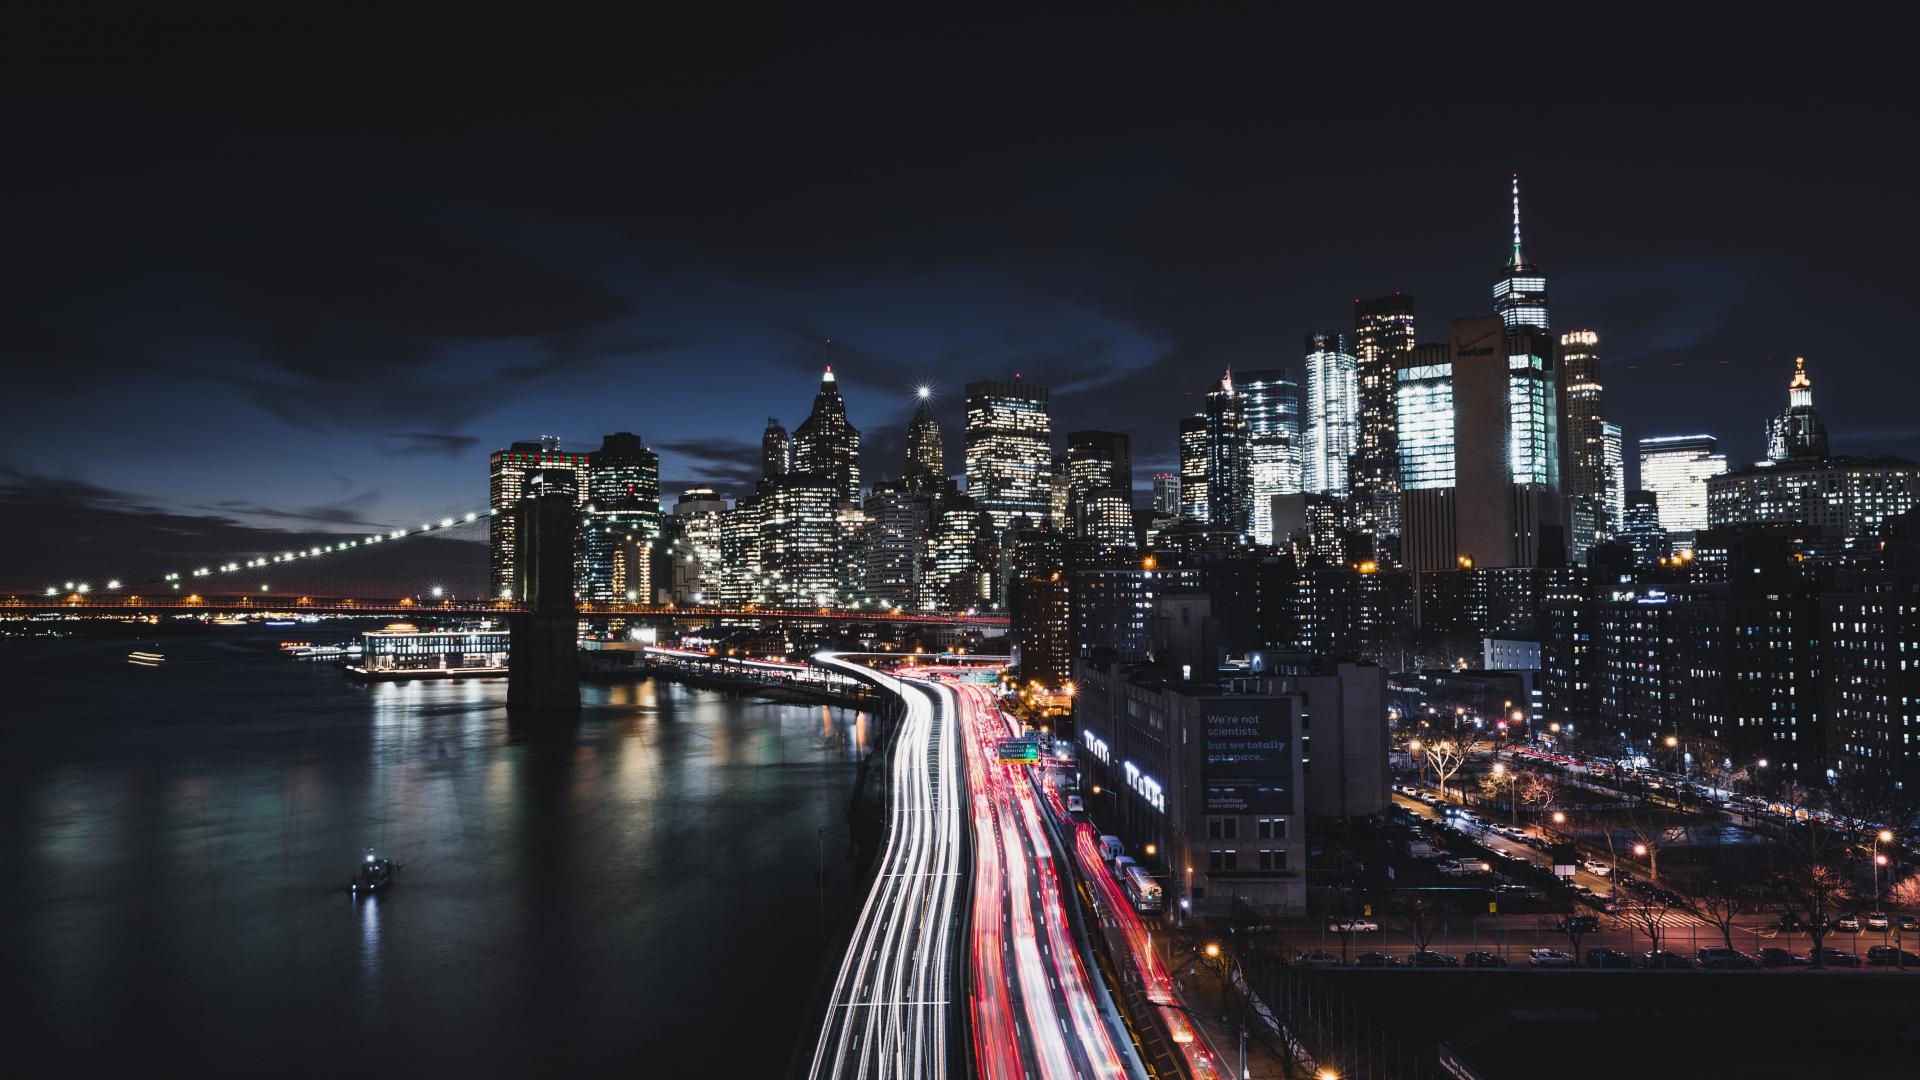 Download 1920x1080 Wallpaper New York City Night Road